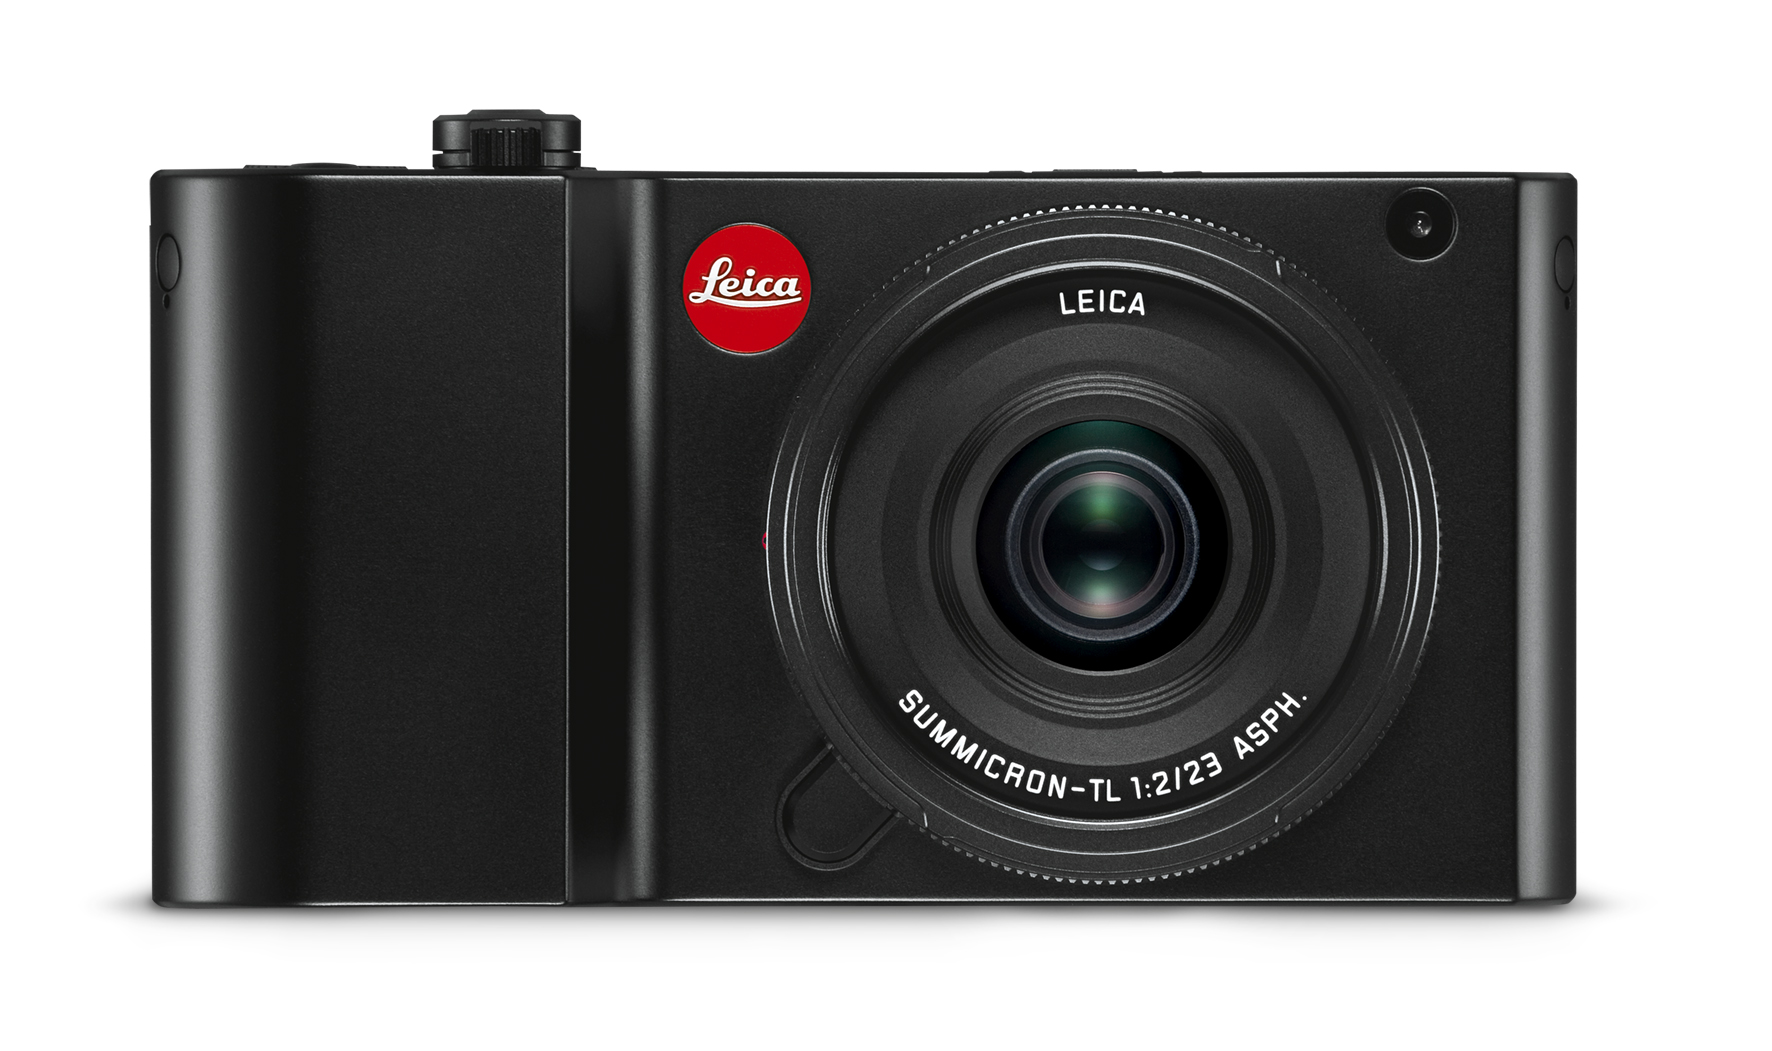 Leica Announces New TL2